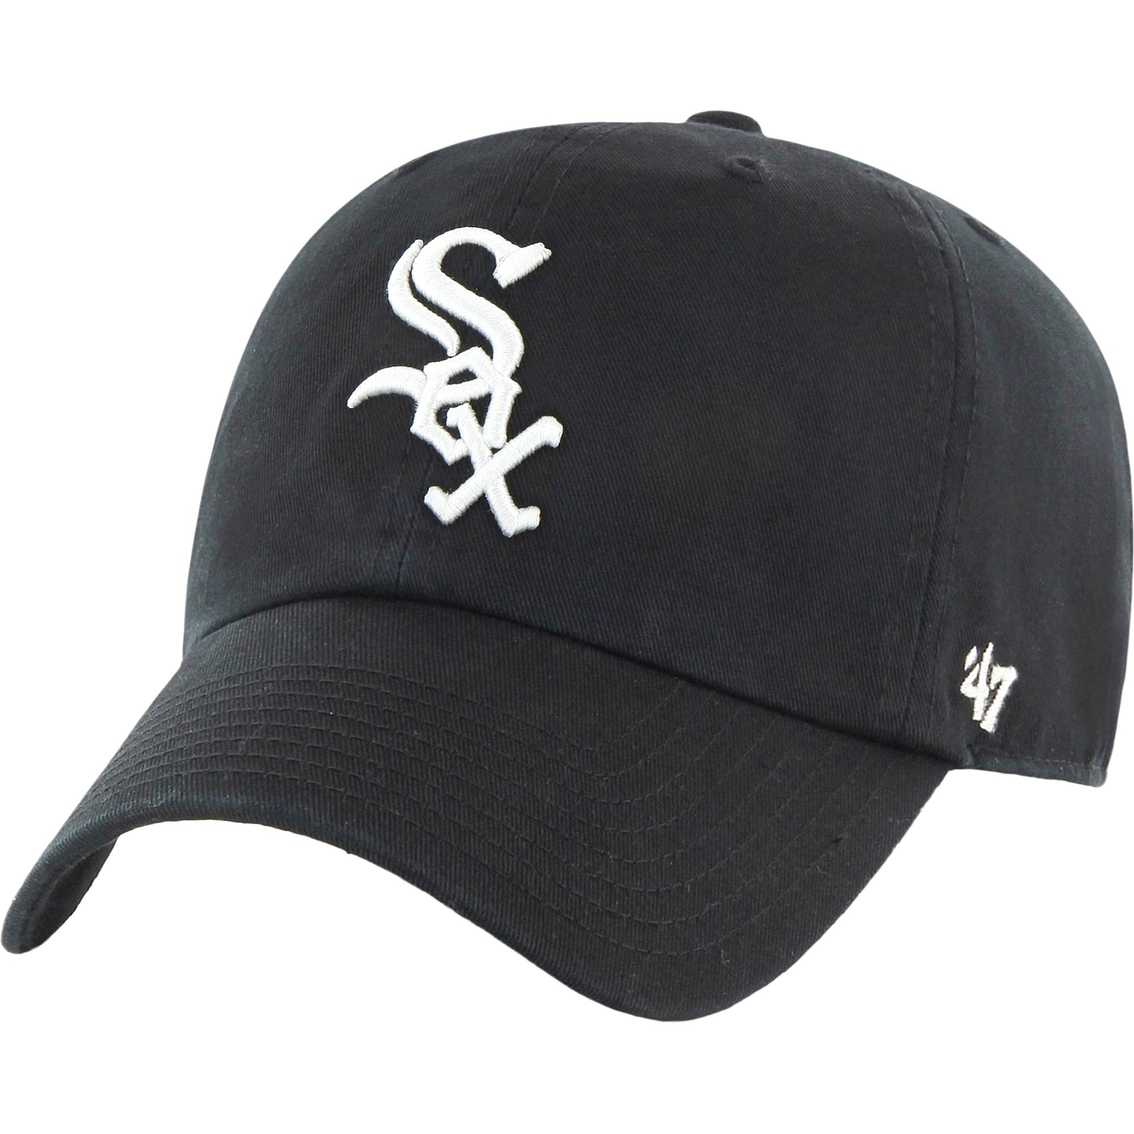 2eb95397cad 47 Brand Mlb Chicago White Sox Clean Up Baseball Cap | Mlb Apparel ...